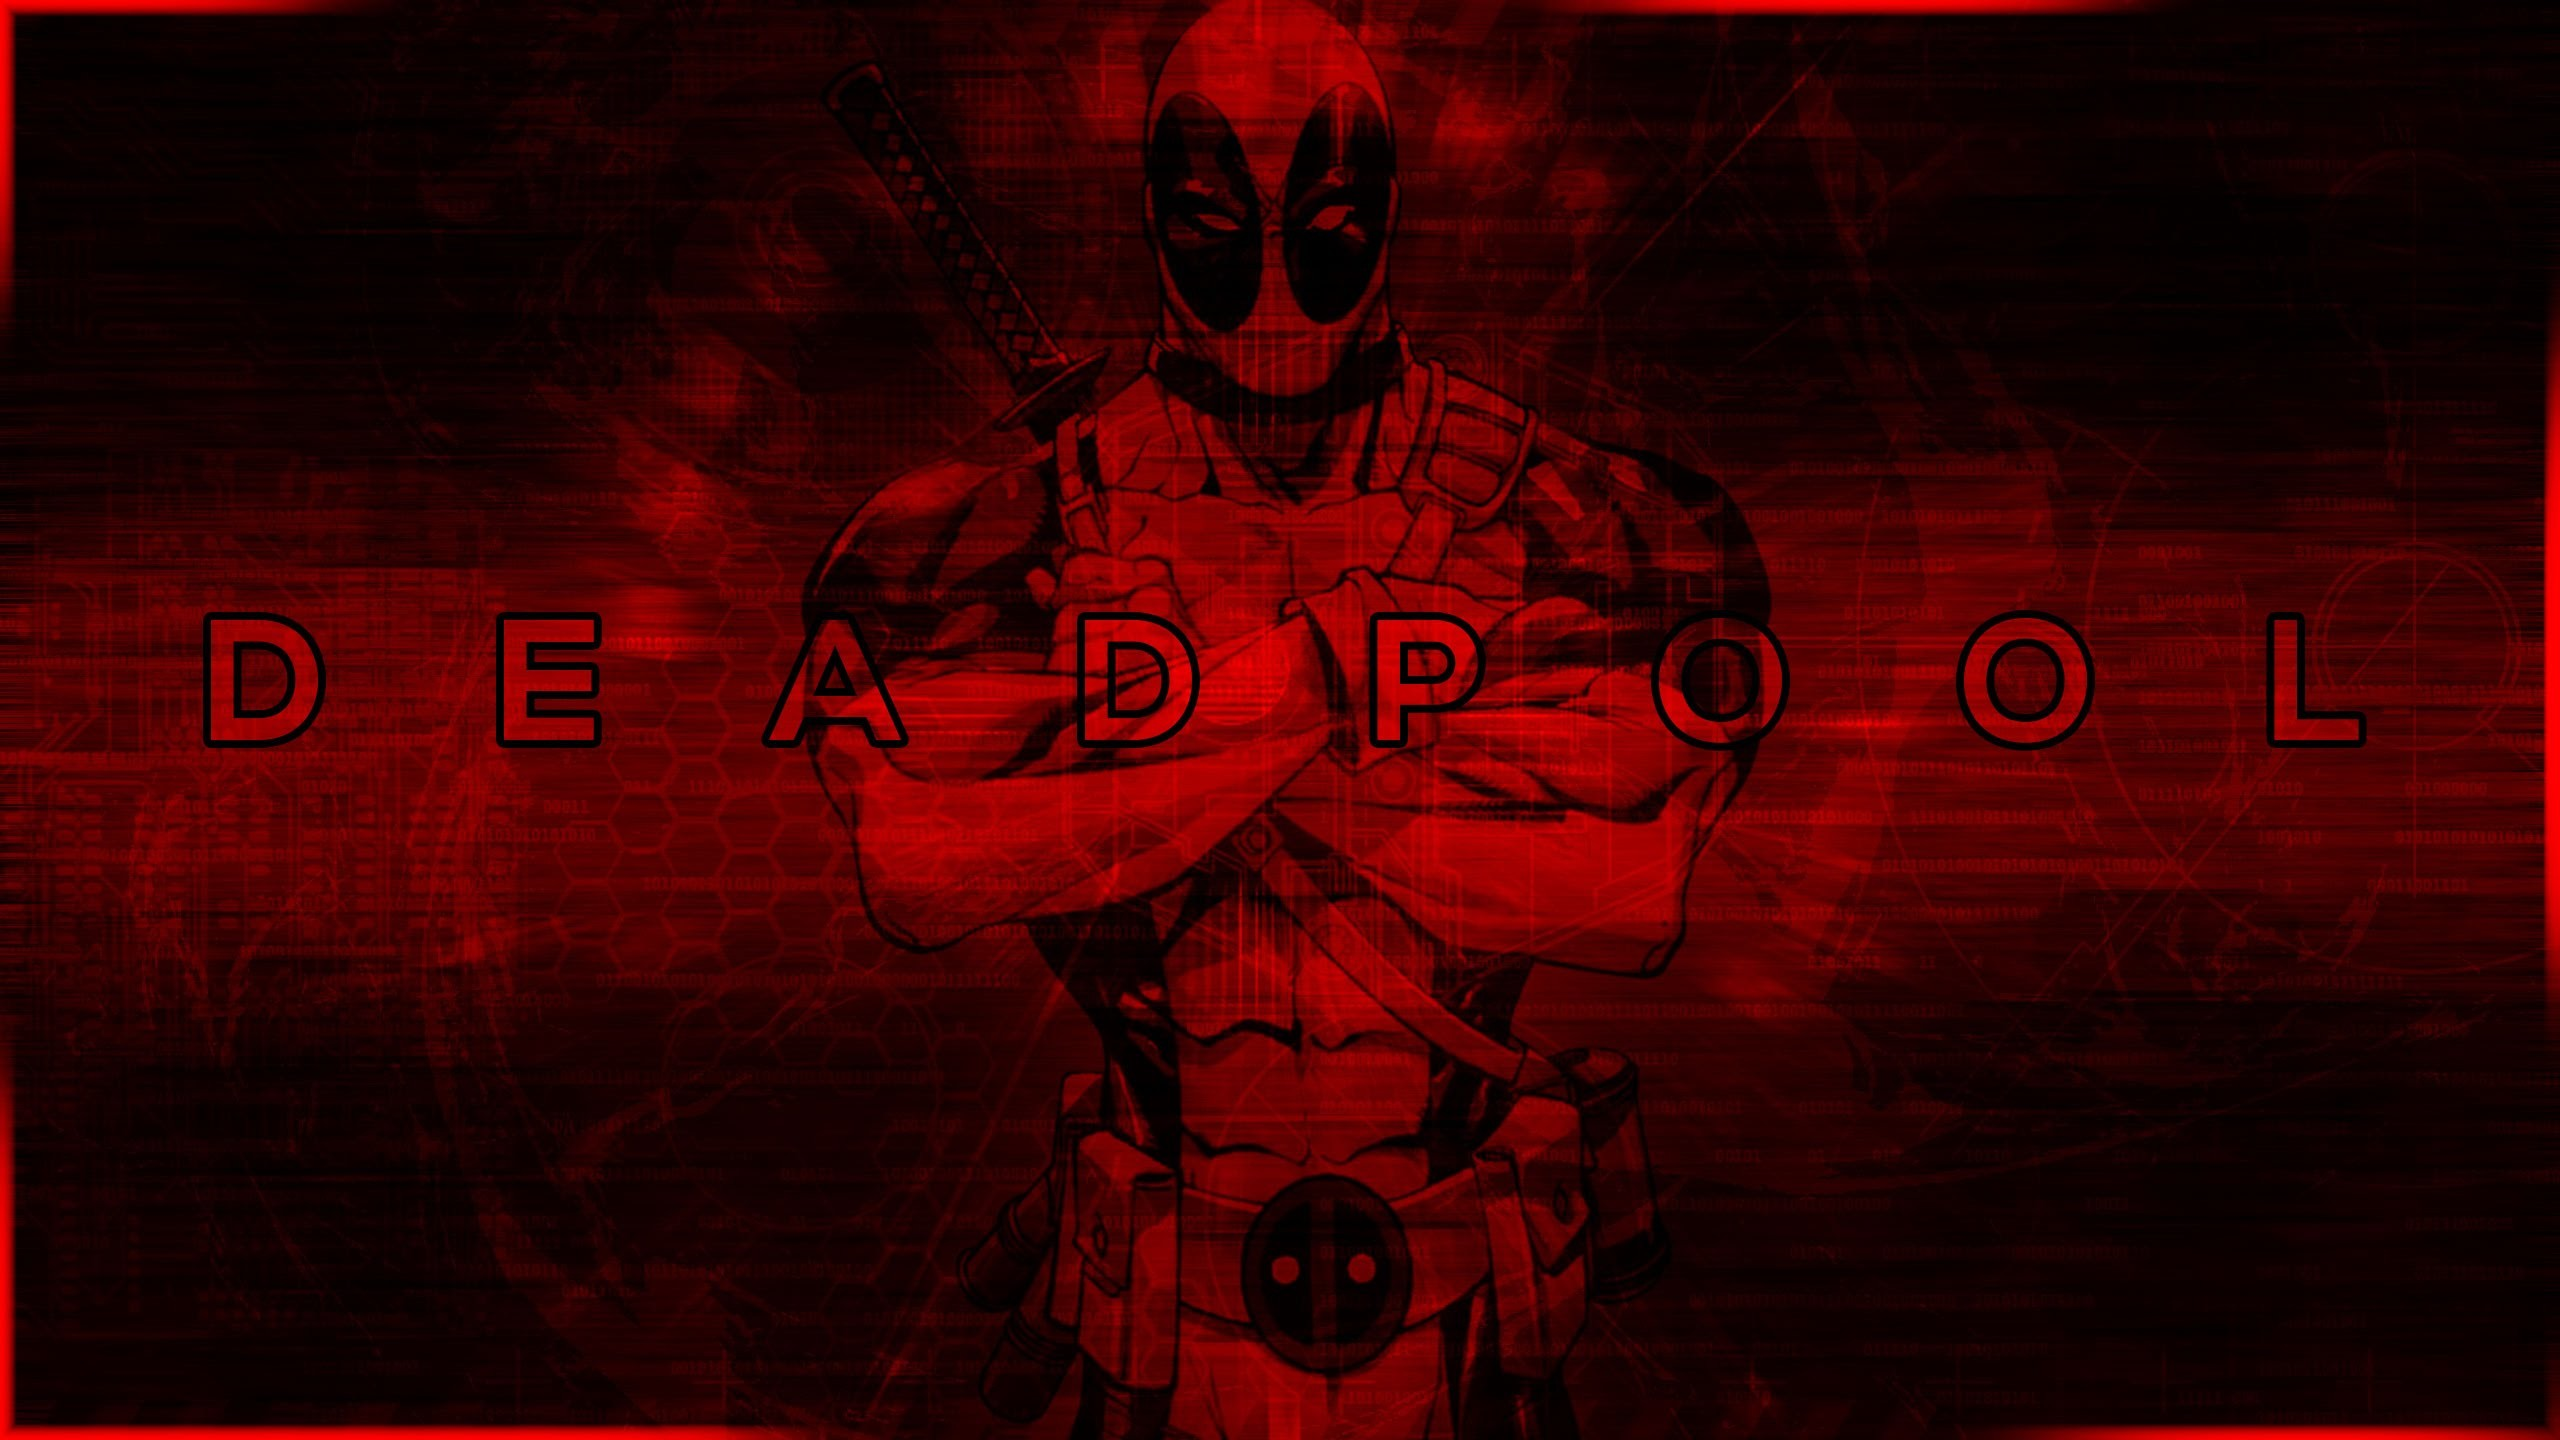 Best 25+ Deadpool wallpaper 4k ideas on Pinterest | Arte de chisisto, Que  es deadpool and Deadpool pelicula